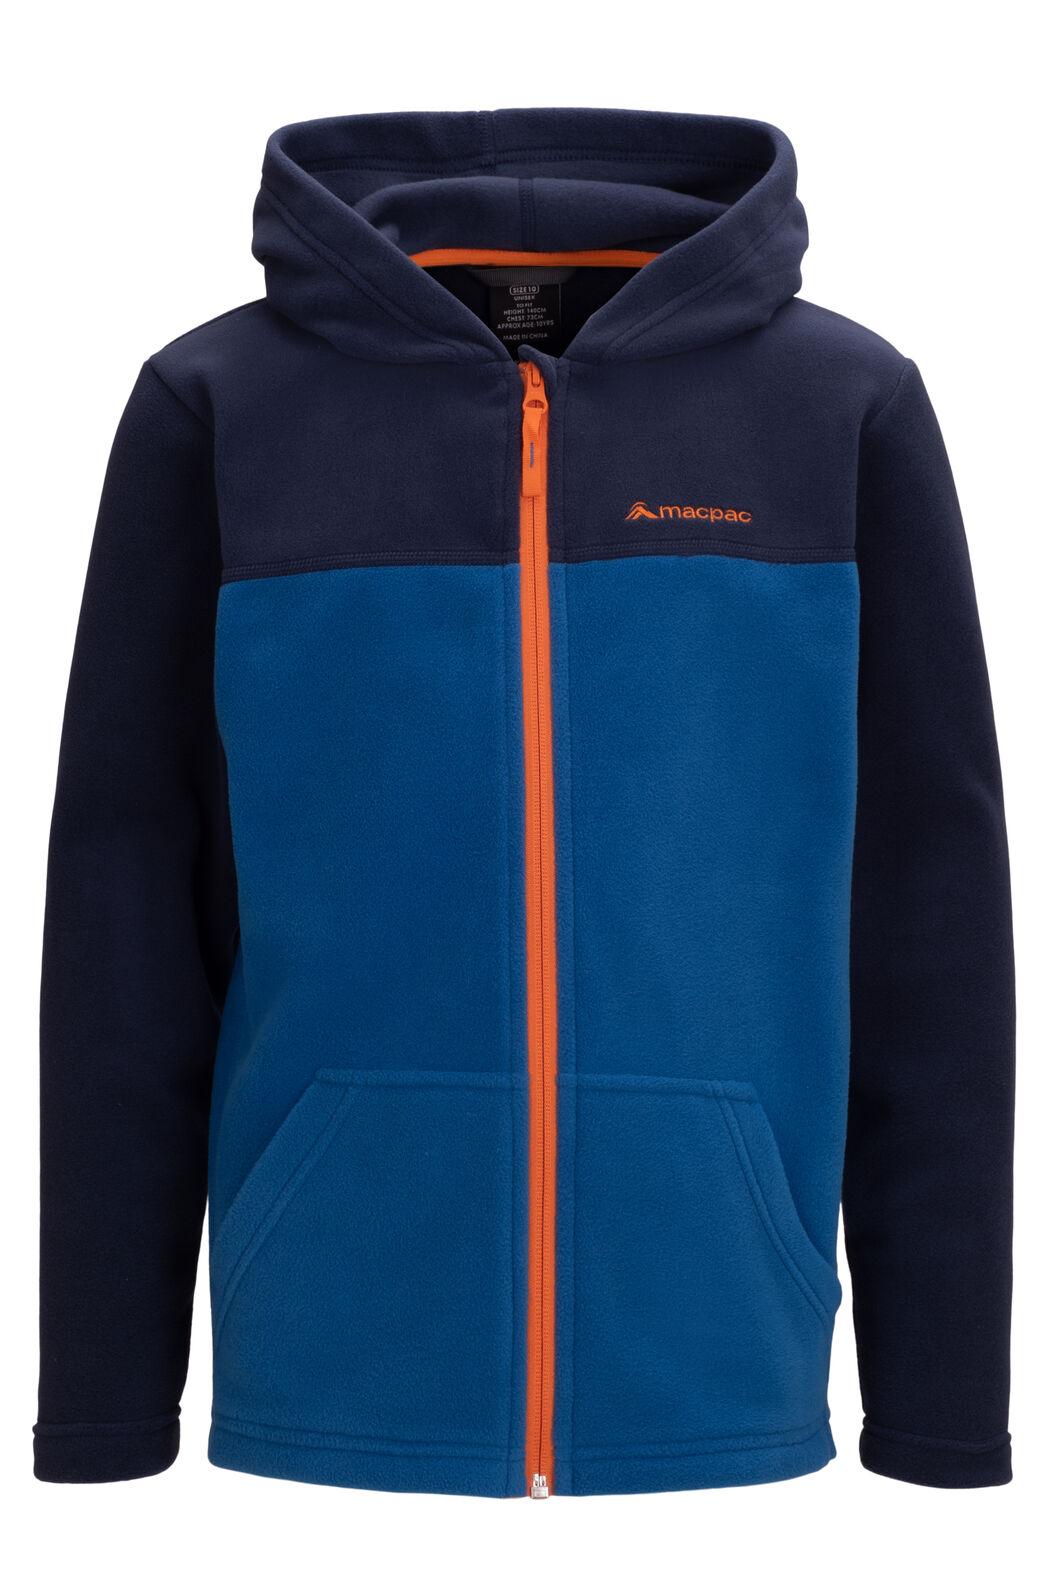 Macpac Kids' Tui Polartec® Fleece Jacket, Black Iris/Classic Blue, hi-res